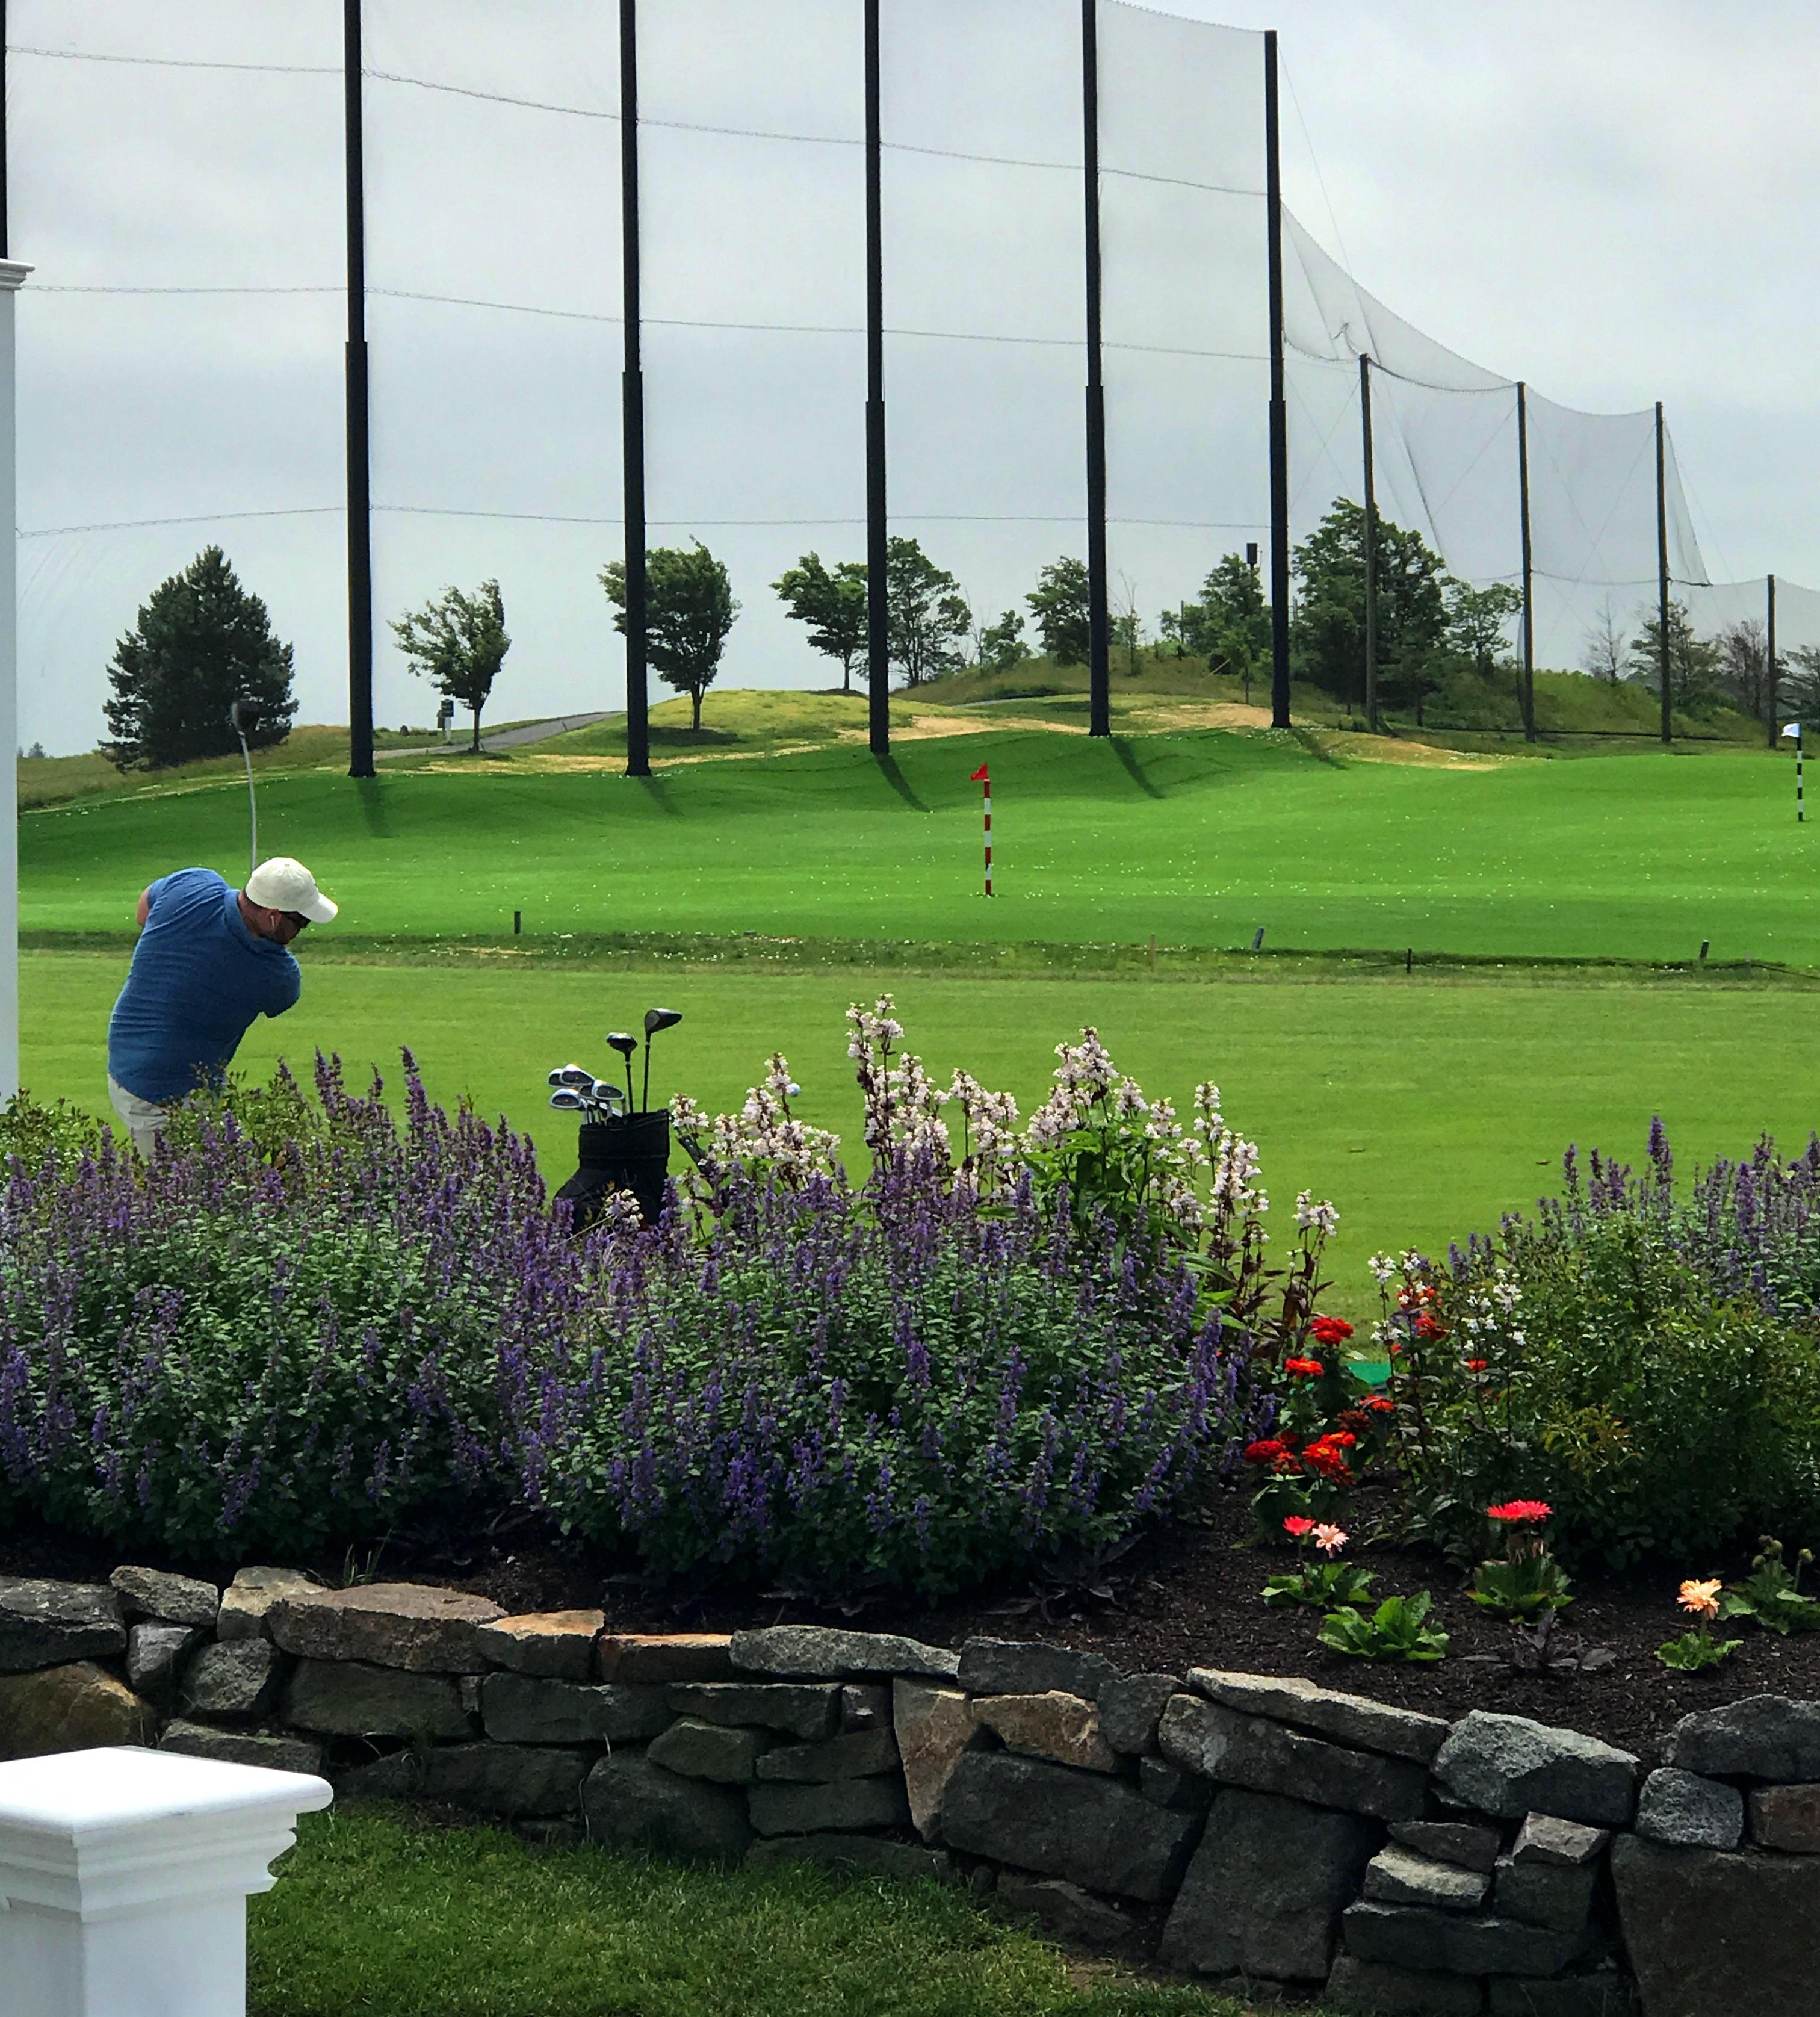 Driving Range Boston South Shore Granite Links Golf Club